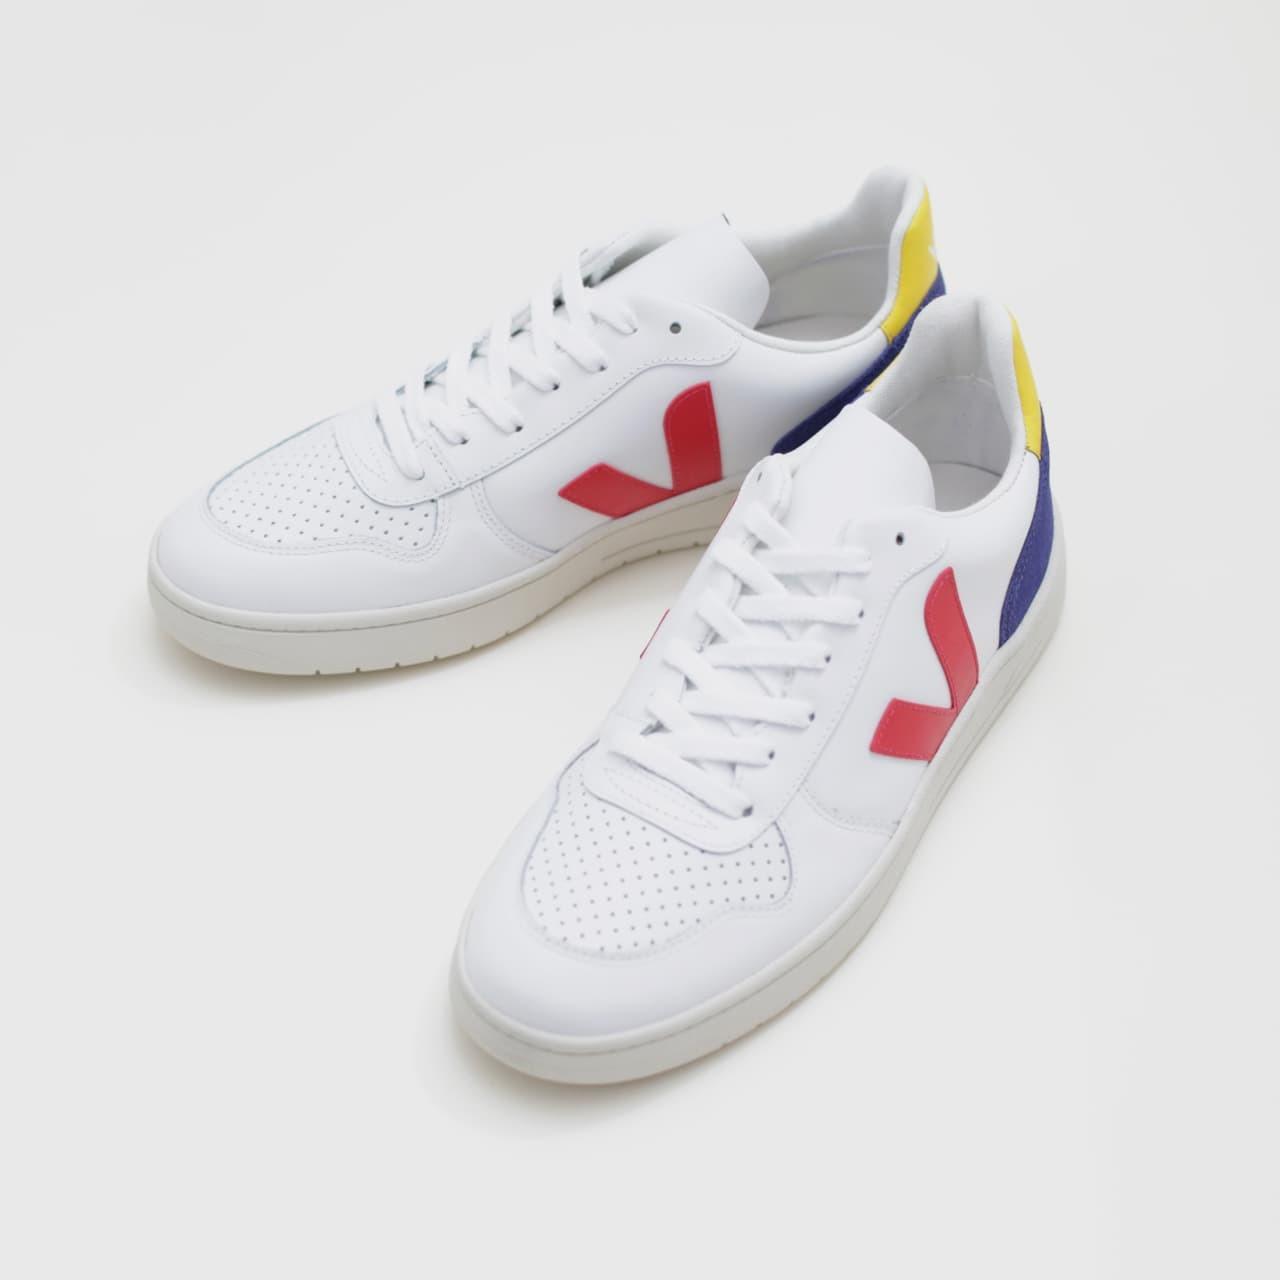 V-10 veja-sneakers-ladys-style-v-10